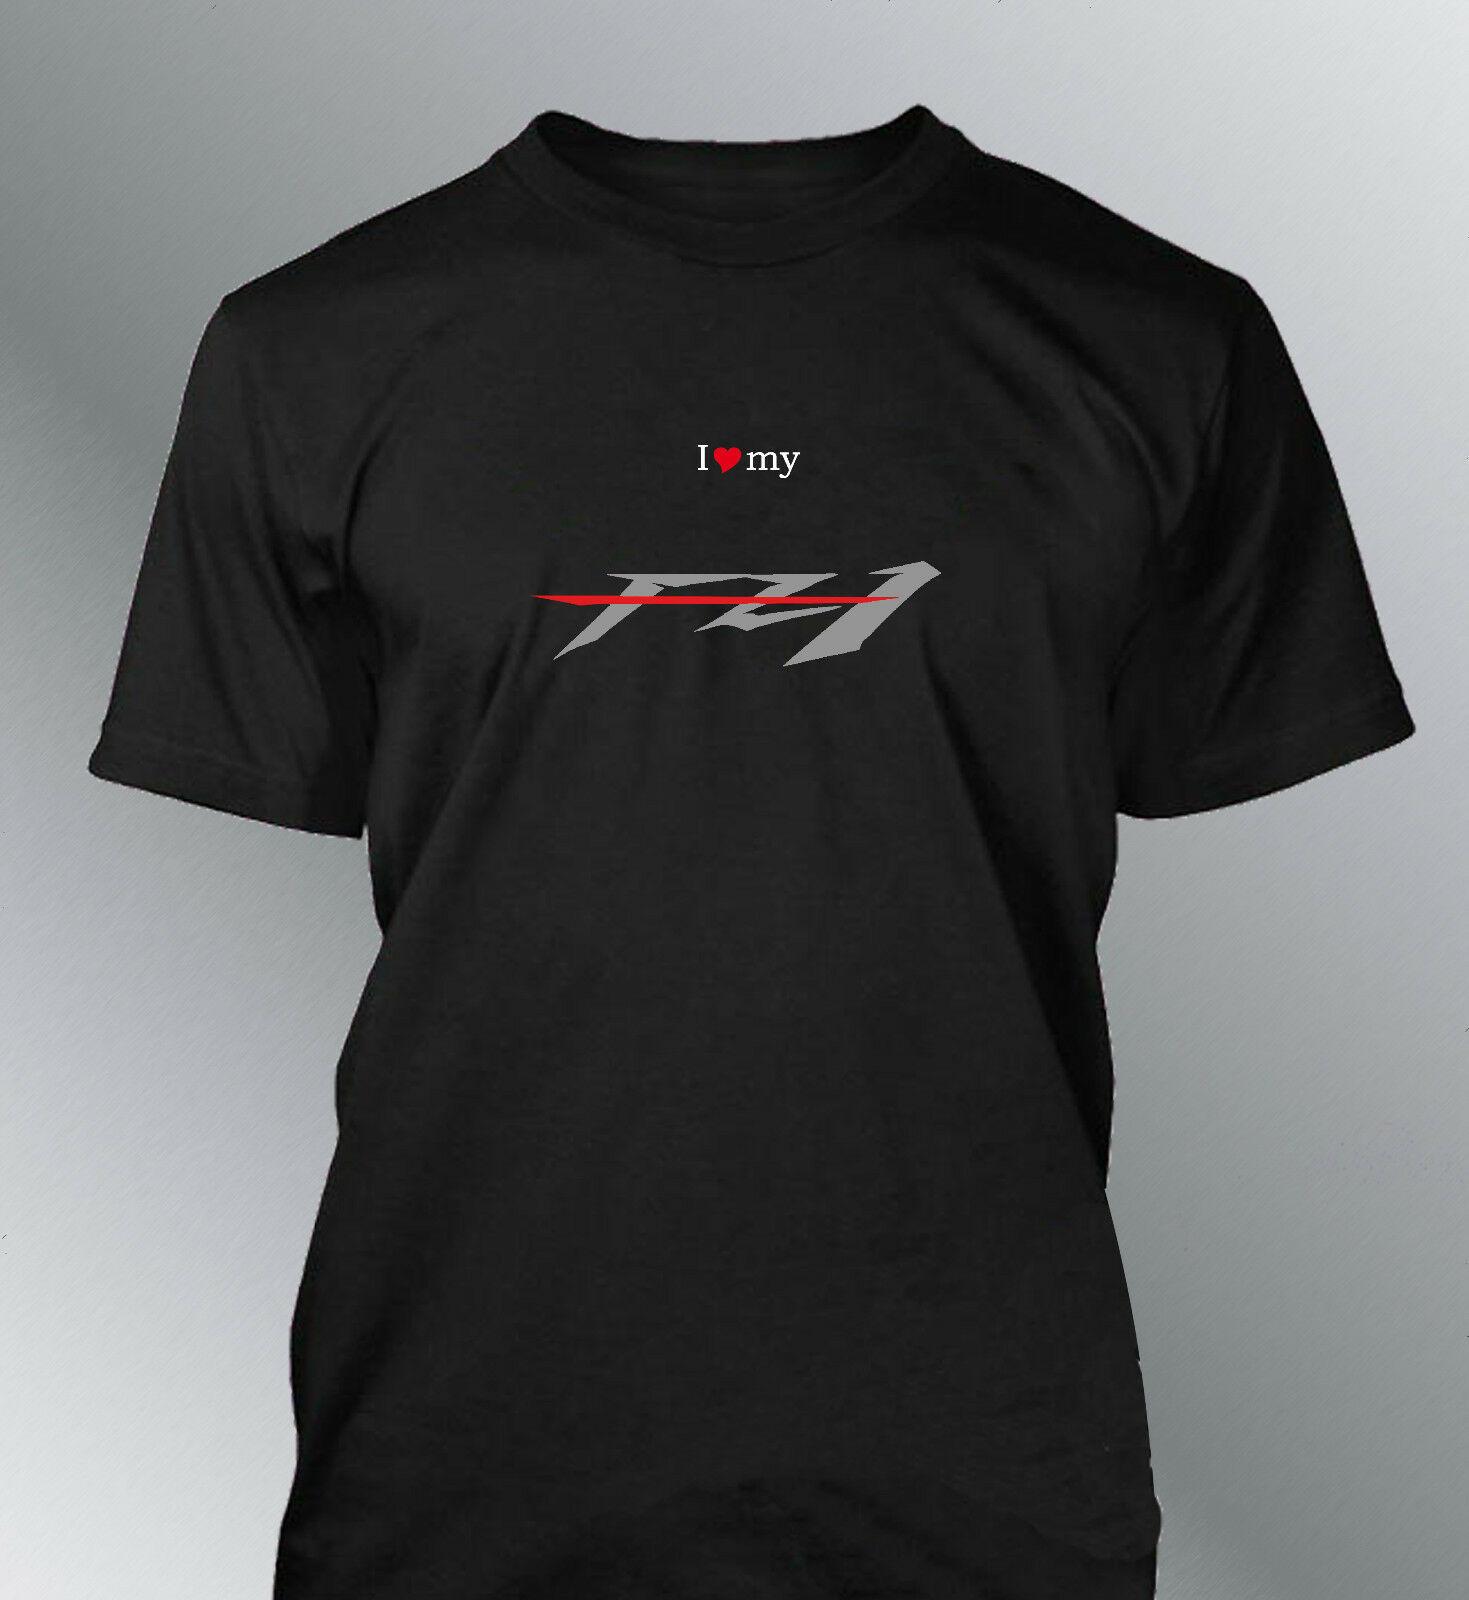 Camiseta personalizada Fz1 S M L Xl Xxl hombre cuello redondo Harajuku Streetwear camisa Menfz 1